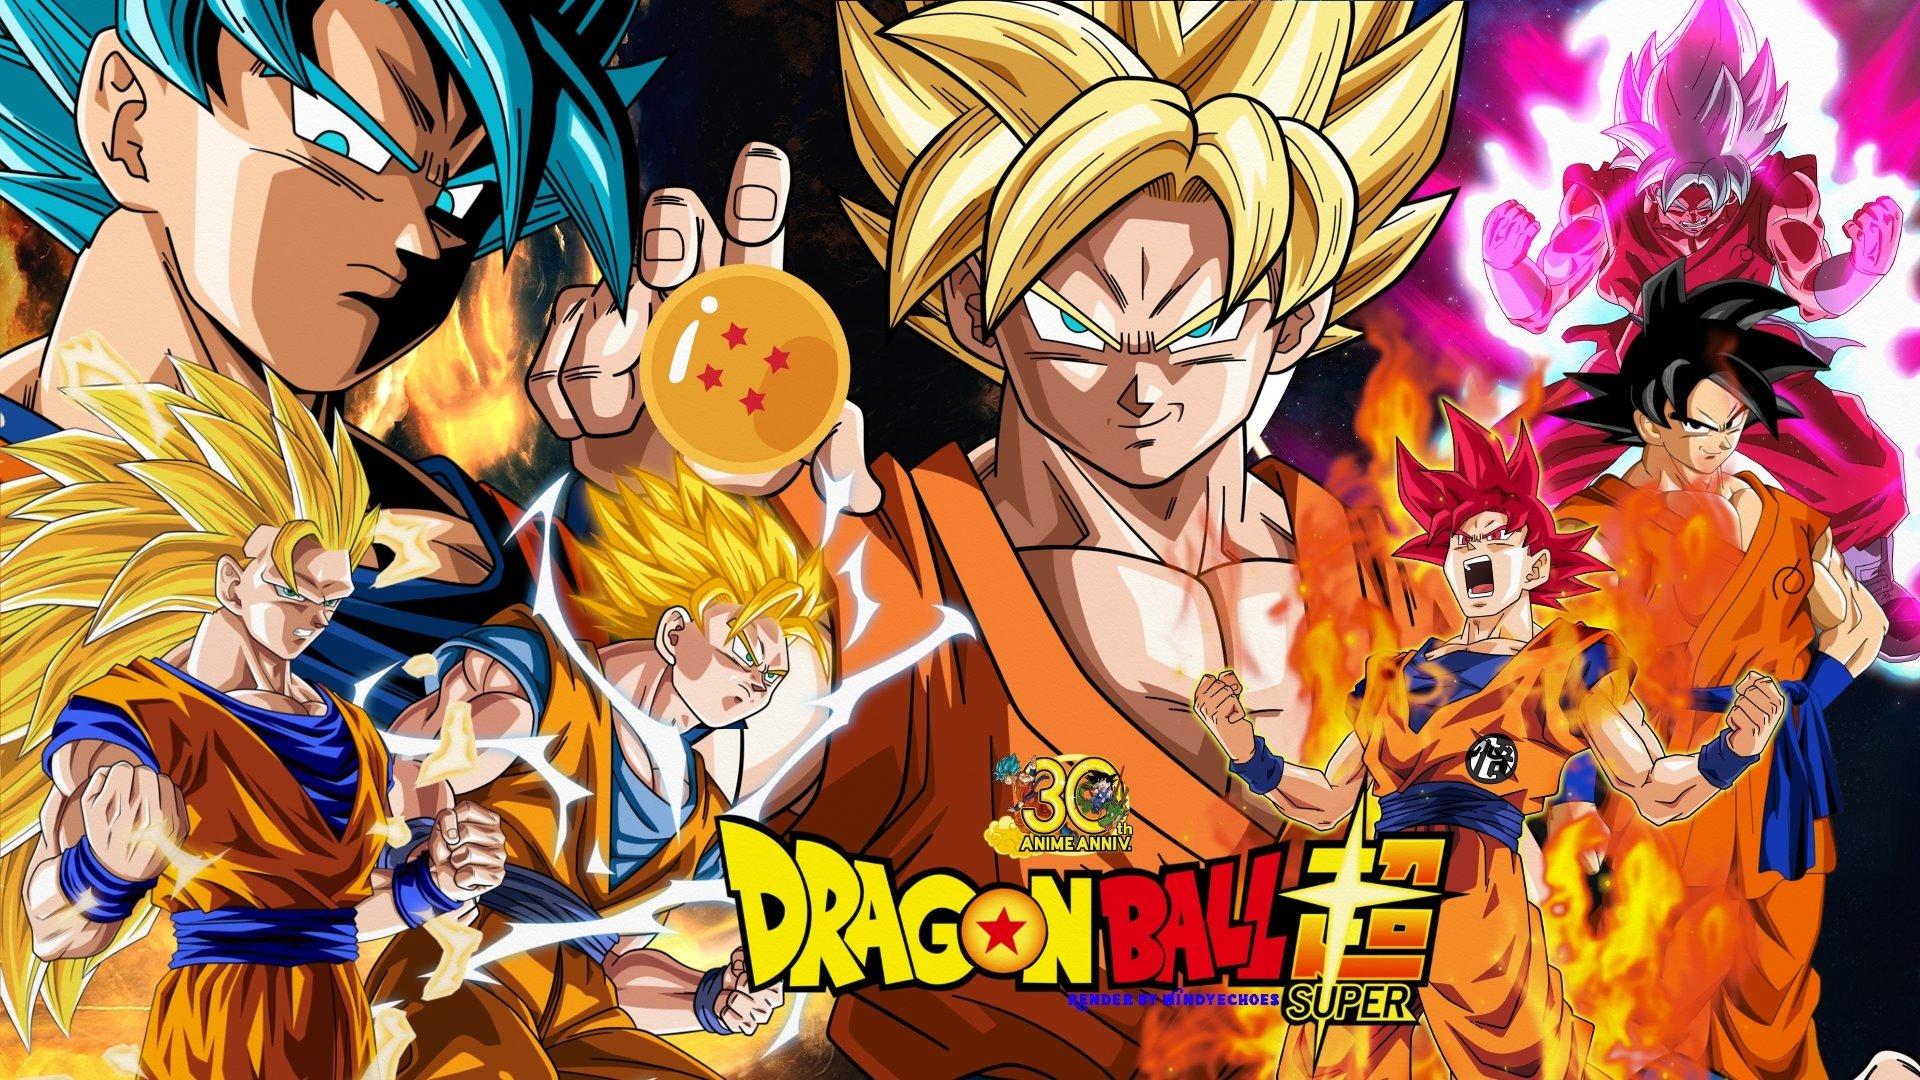 Dragon Ball Super Fondo de pantalla HD | Fondo de Escritorio | 1920x1080 | ID:772376 - Wallpaper ...